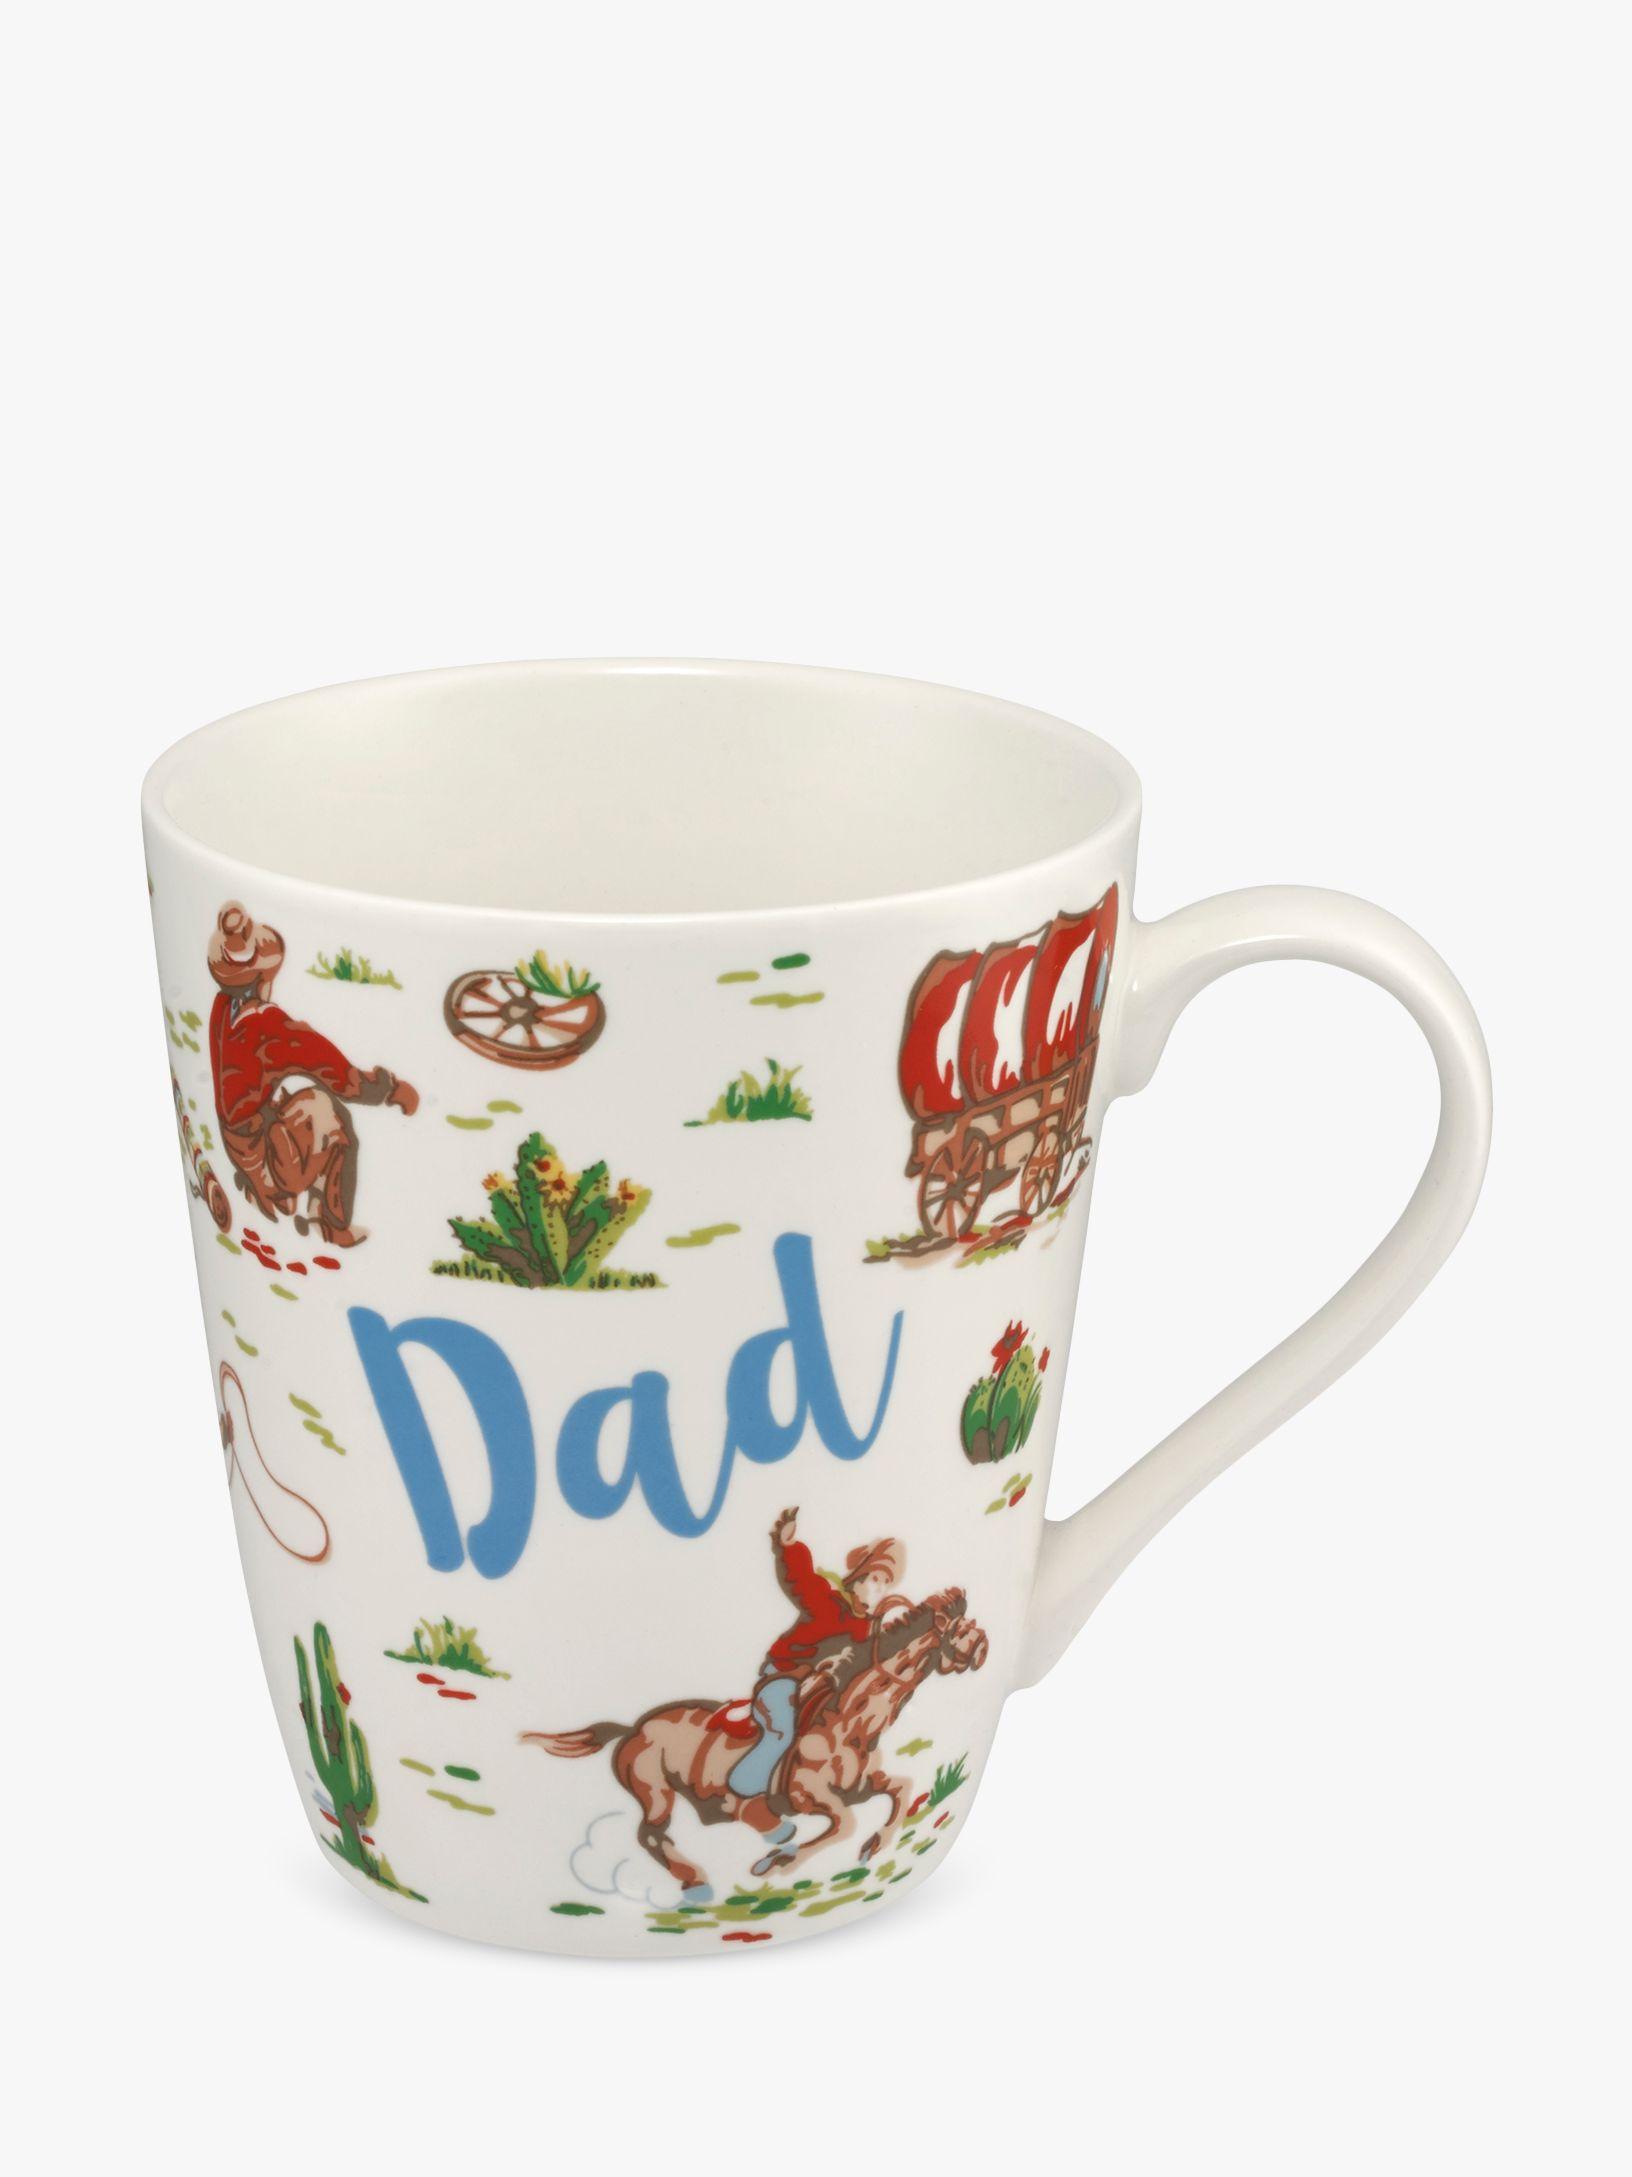 Cath Kidston Cath Kidston Dad Cowboy Mug, 400ml, Multi